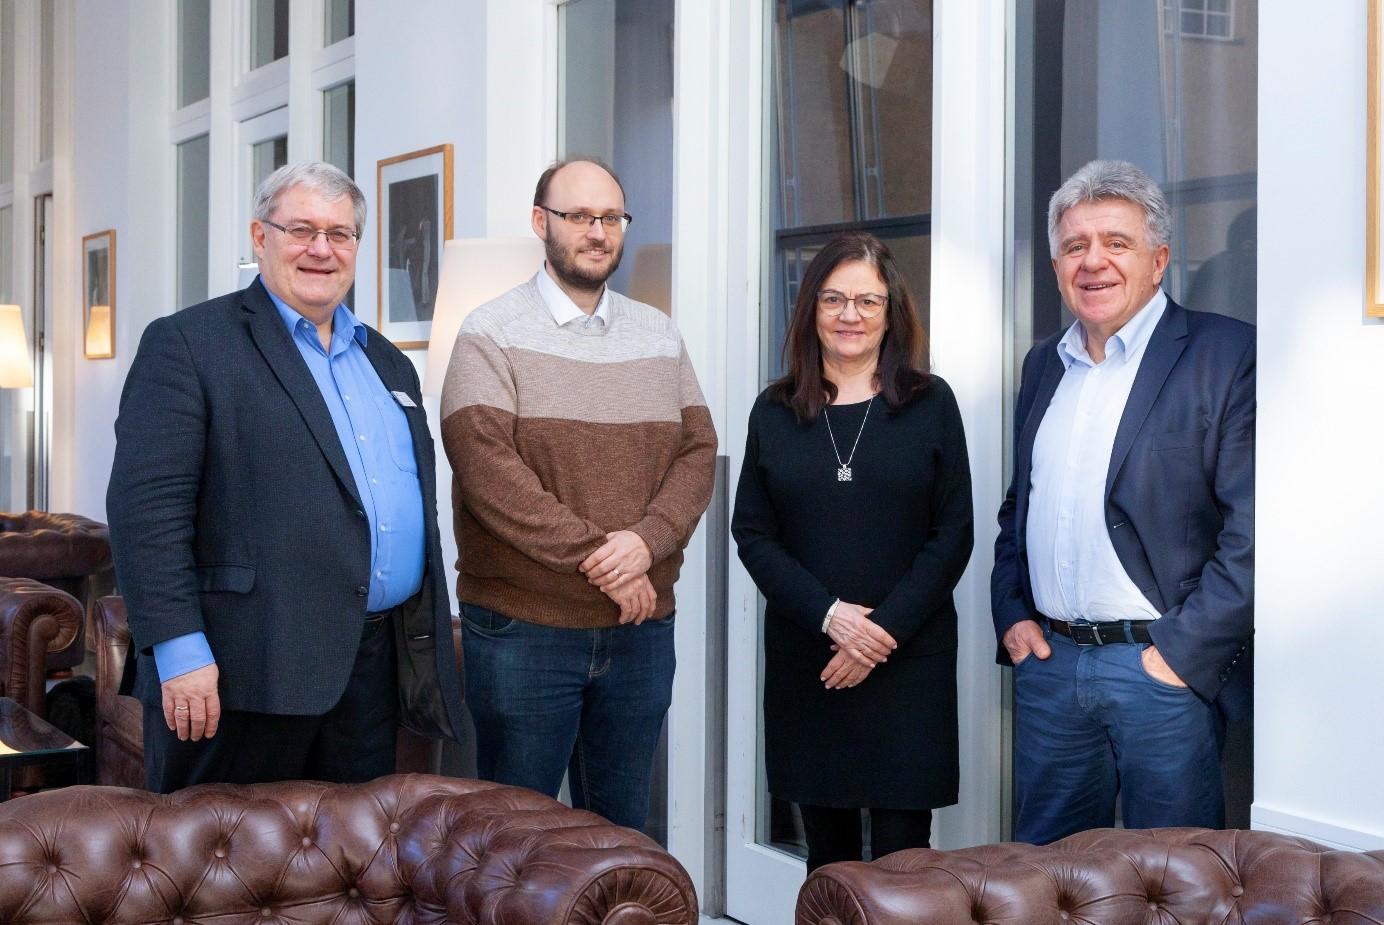 Členové poroty Univ.-Prof. Dr.-Ing. Rolf Breitenbücher; doc. Ing. Karel Dvořák, Ph.D.; prof. dr hab. inż. Maria Kaszyńska a prof. dr hab. inż. Jan Deja (zleva doprava) (Fotografie: CEMEX Deutschland AG / Mehdi Bahmed)